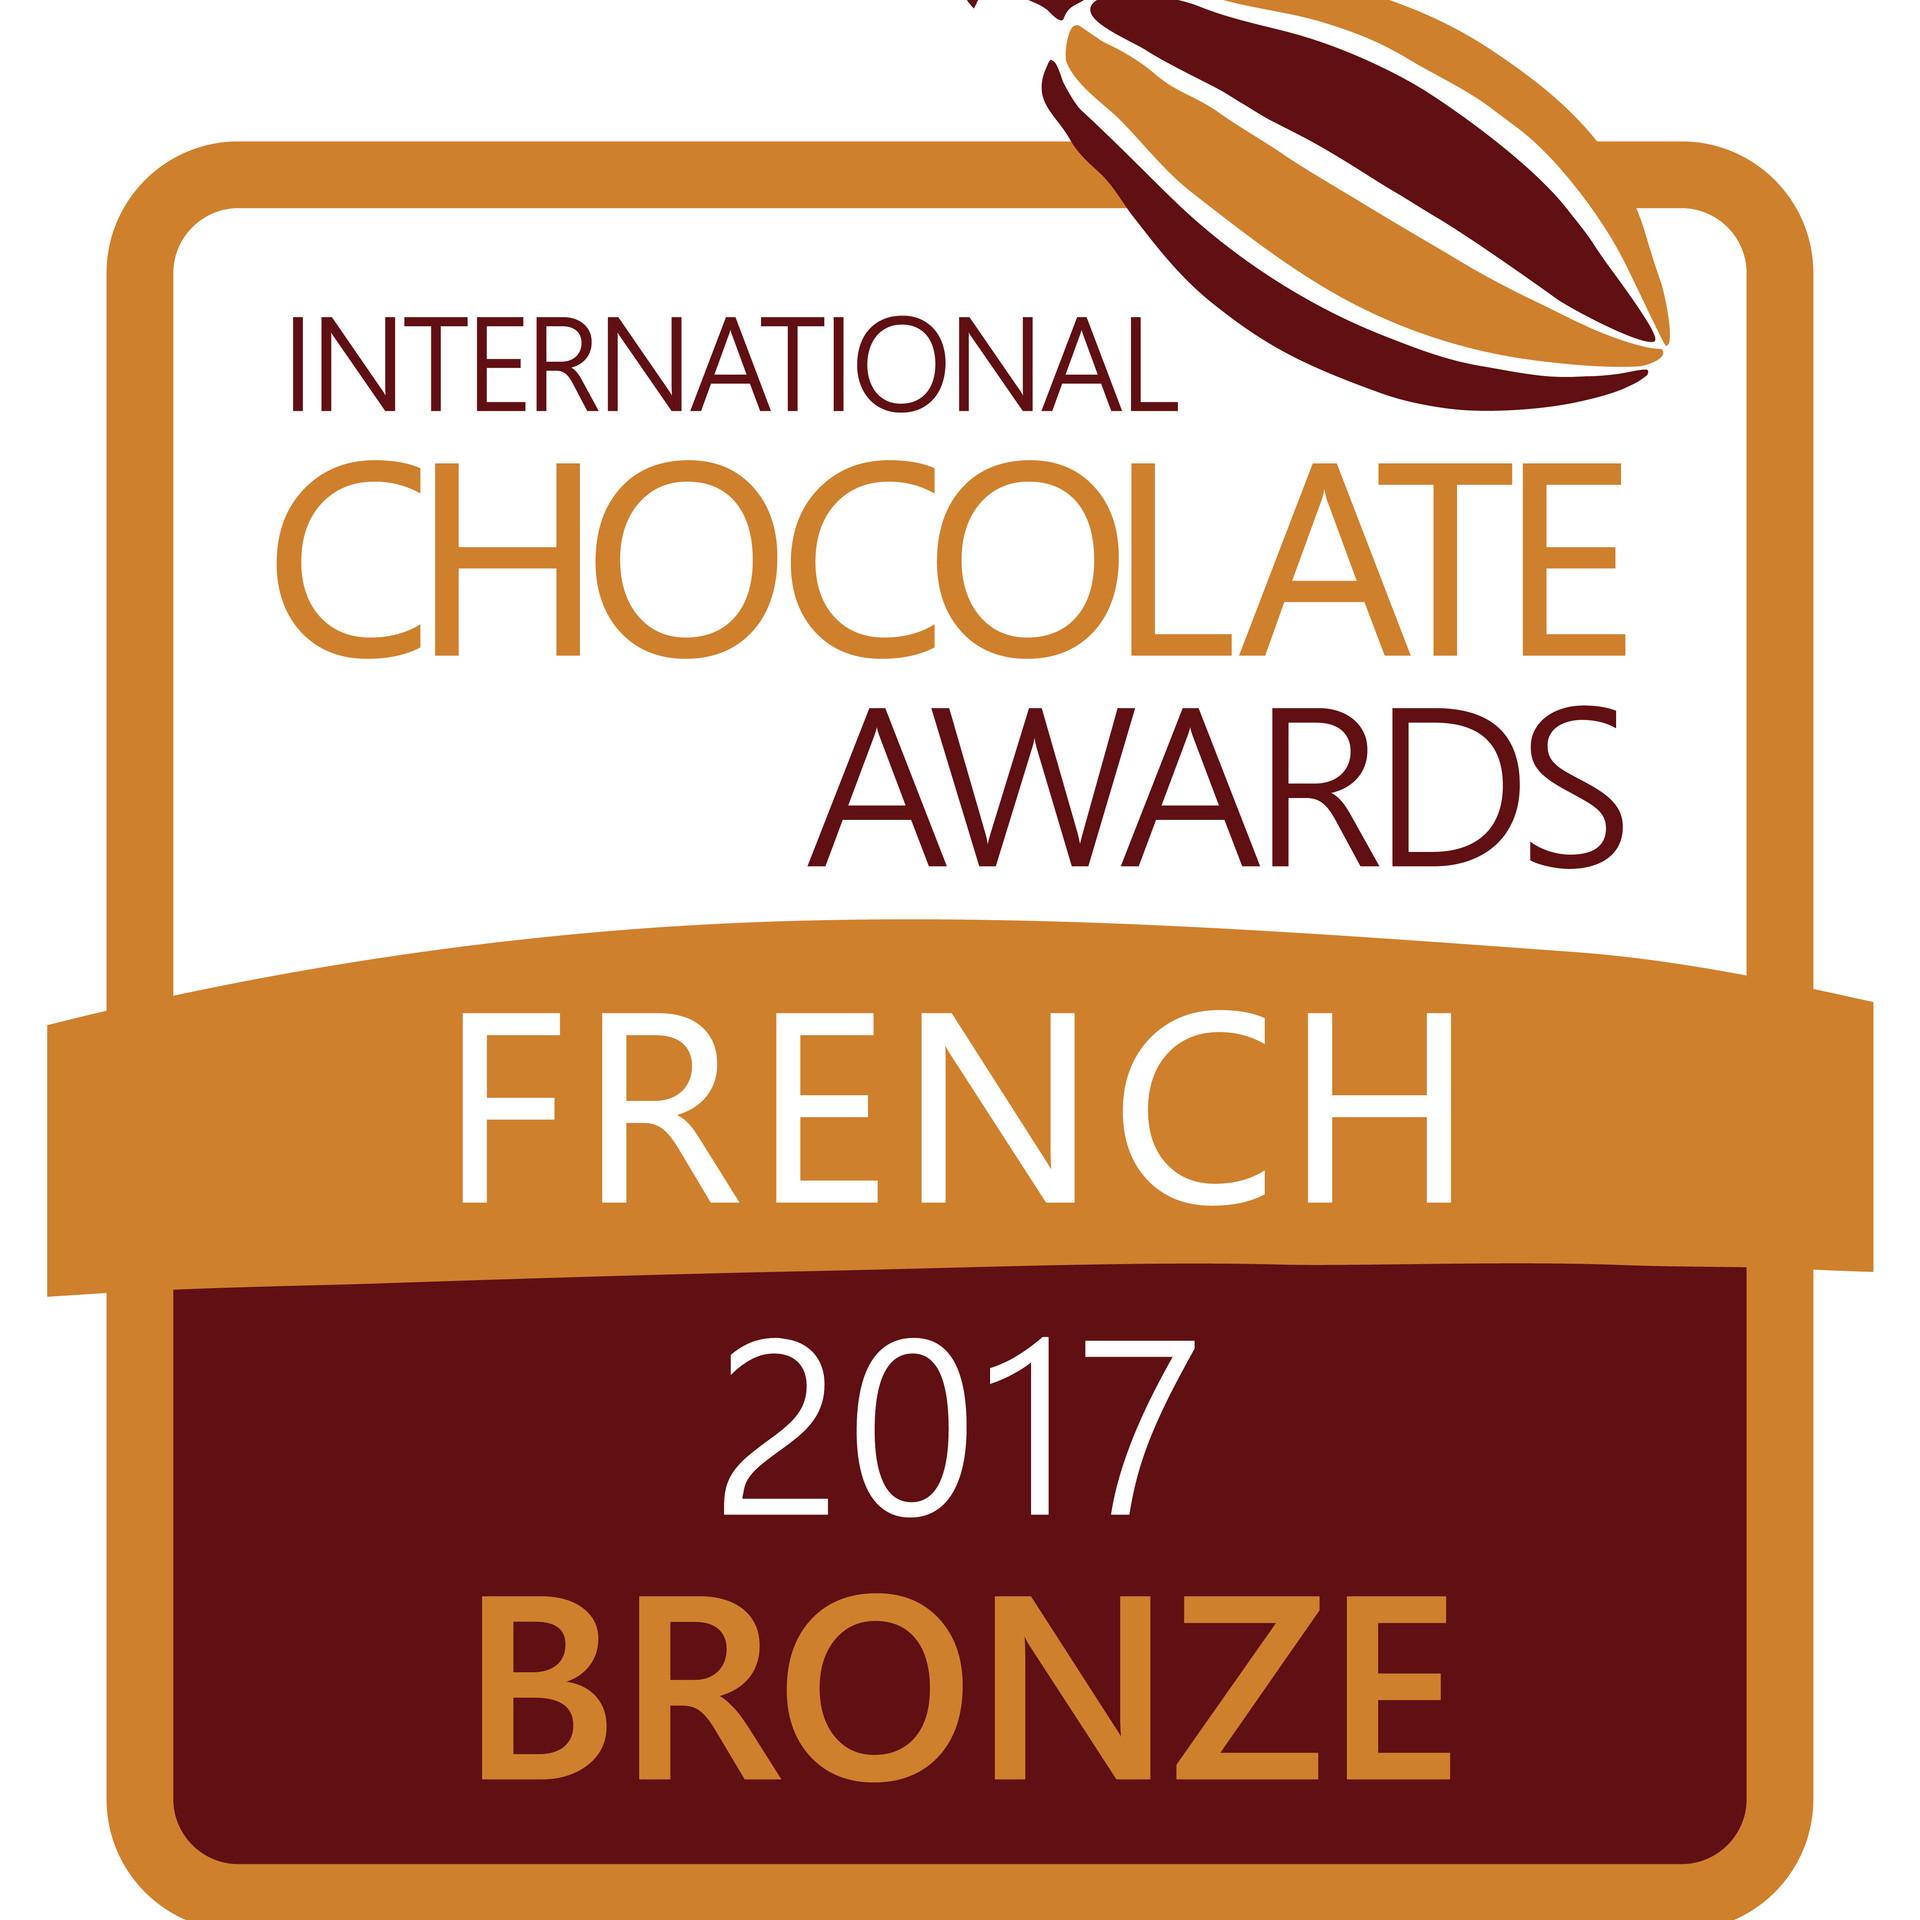 ica-prize-logo-2017-bronze-french-rgb.jpg